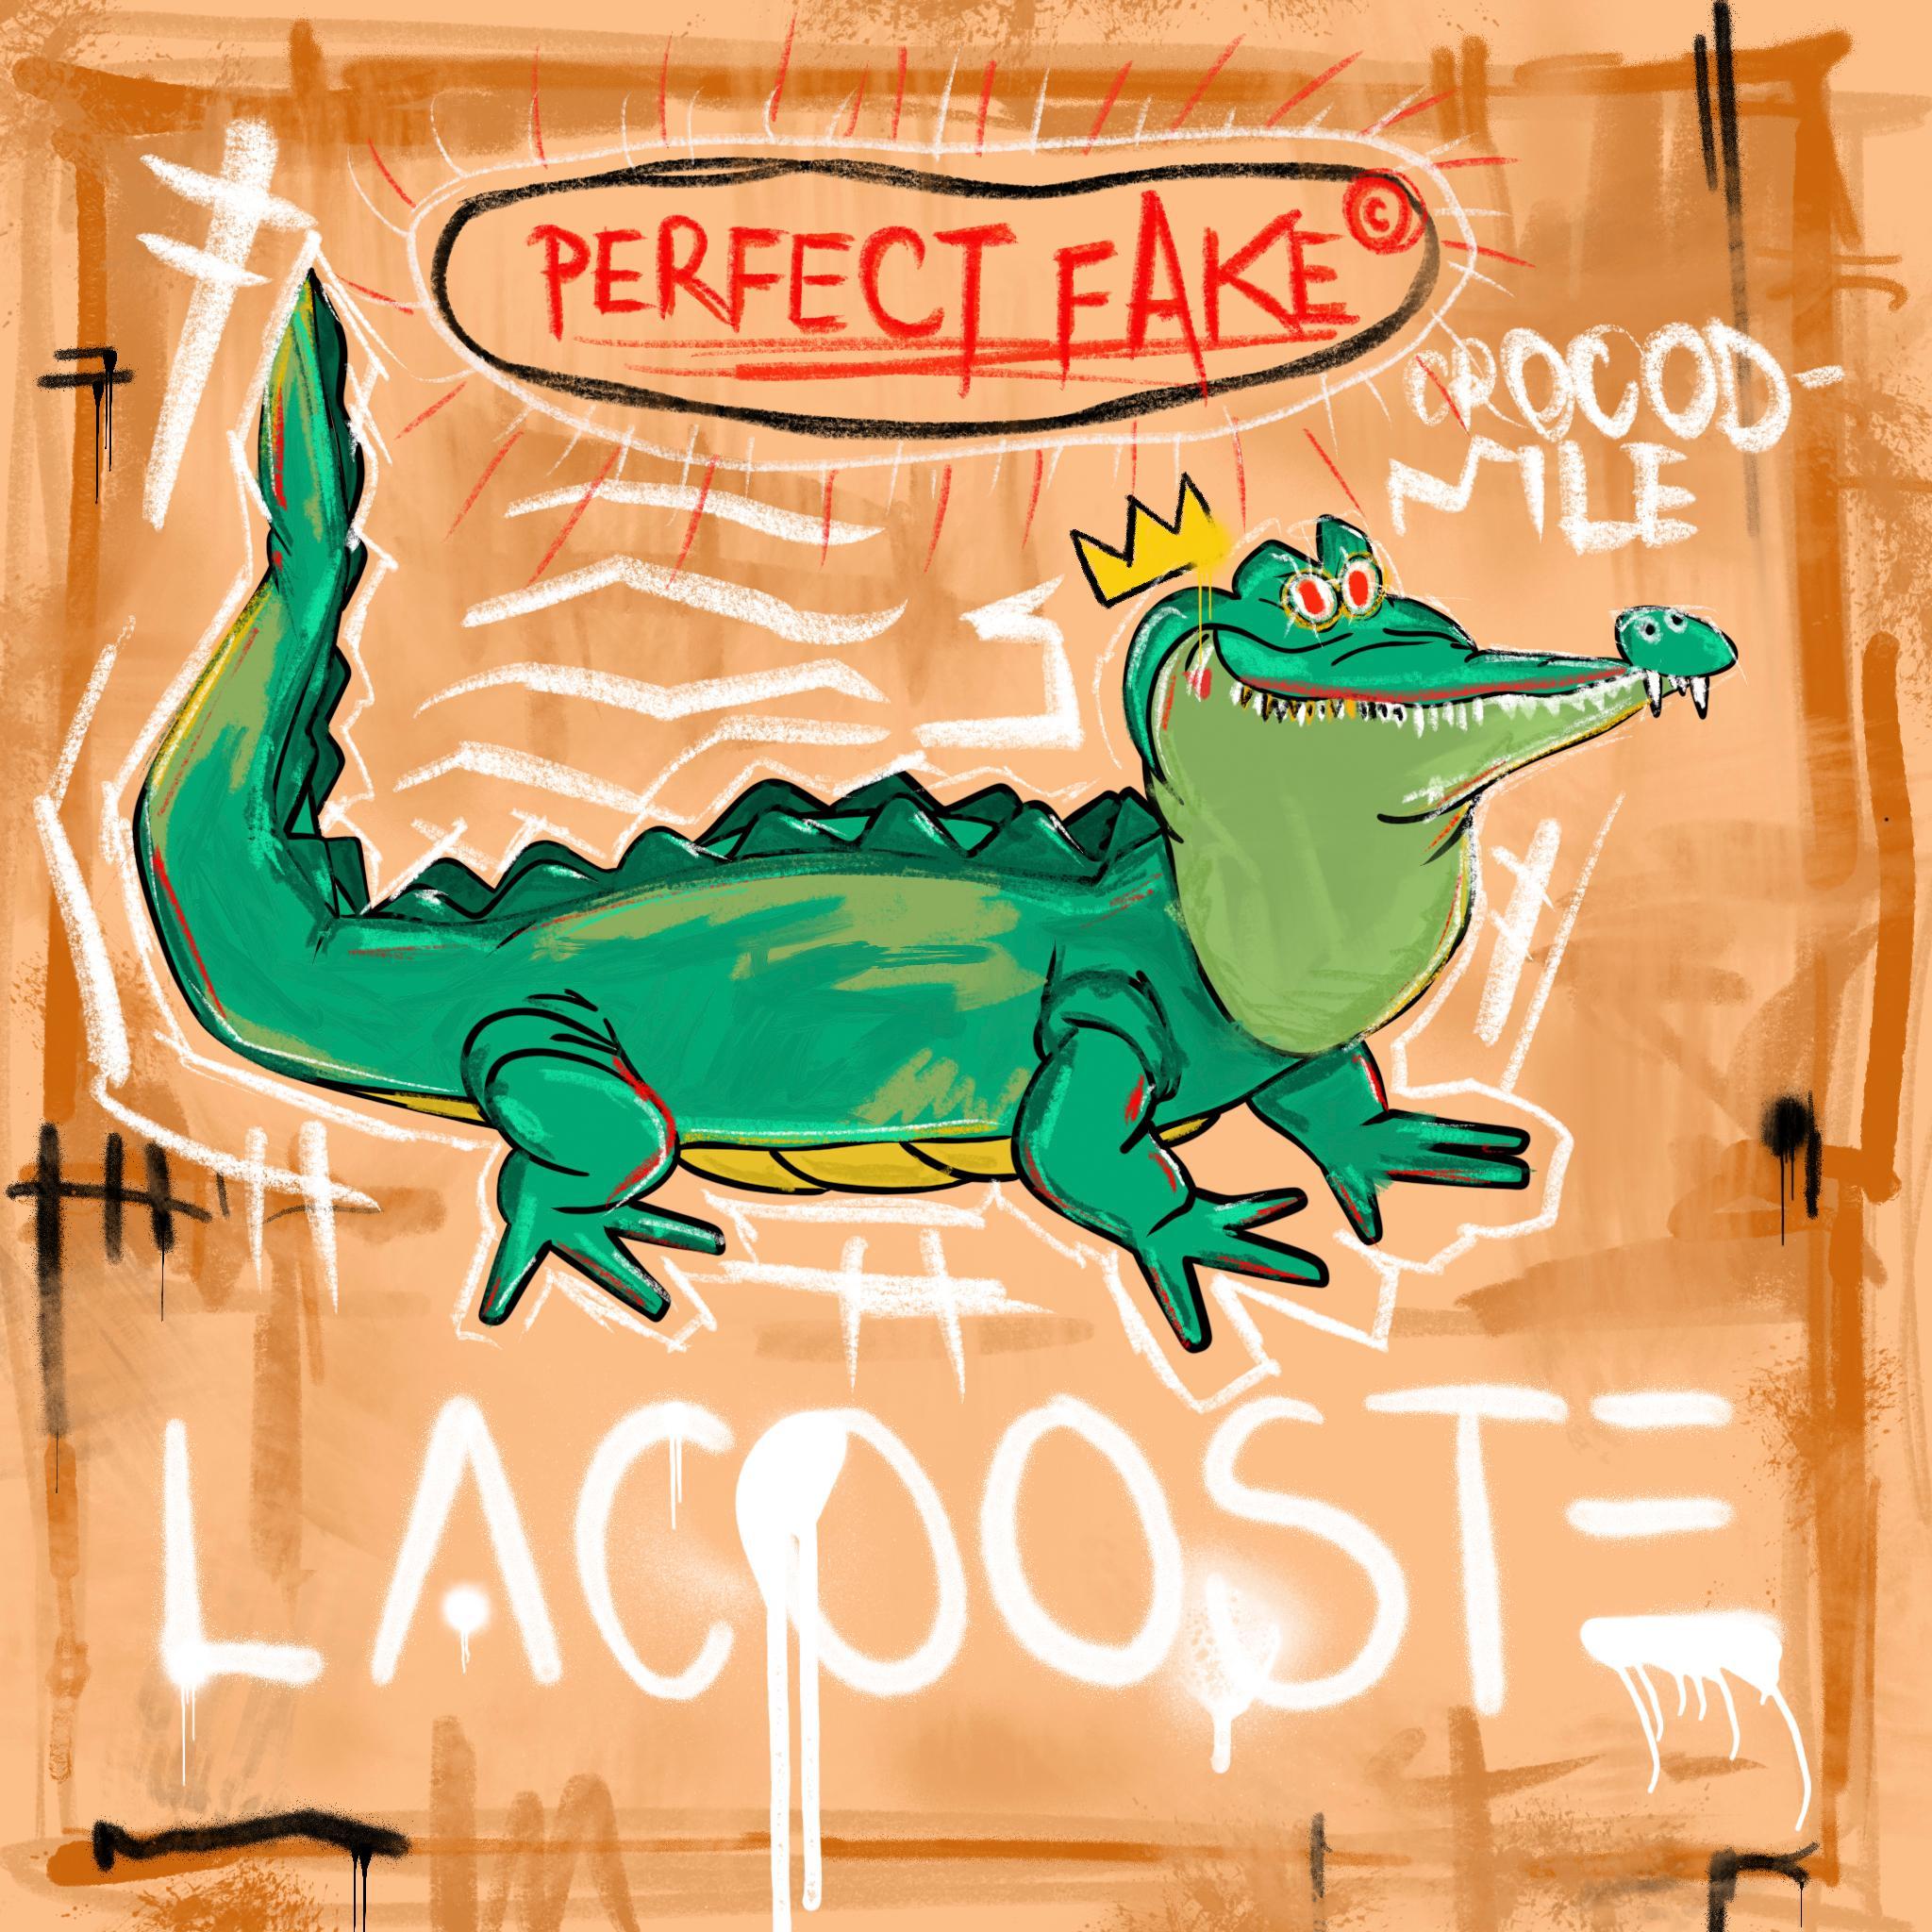 Perfect Fake, Pop Art, Street Art, Croco, Lacoste, Basquiat, Painting